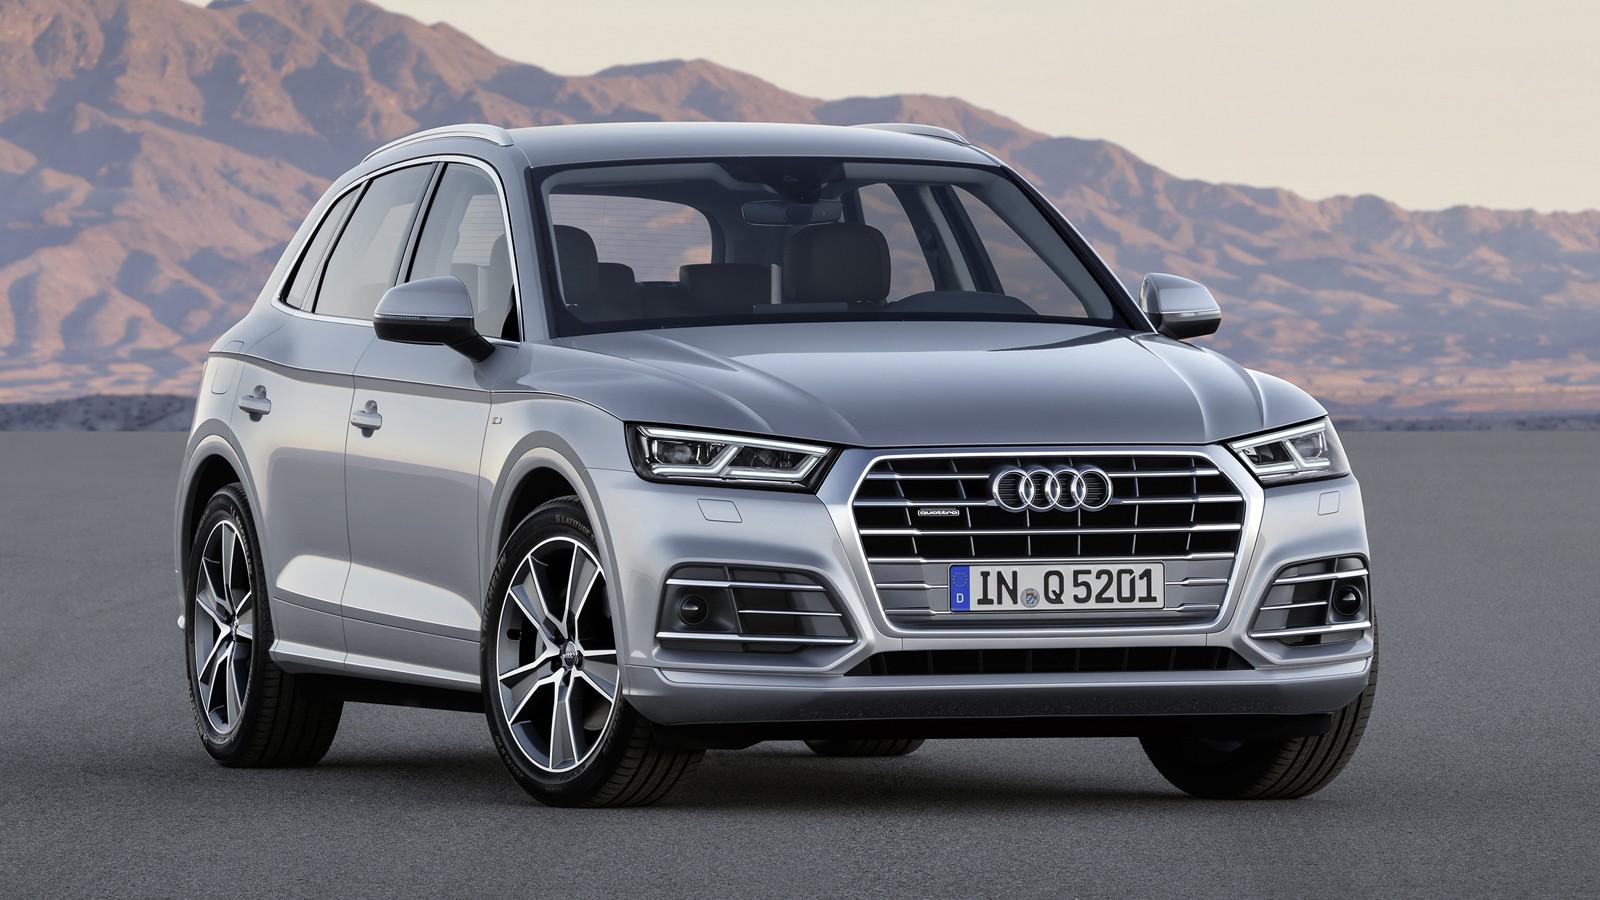 Audi Q5 Paris front